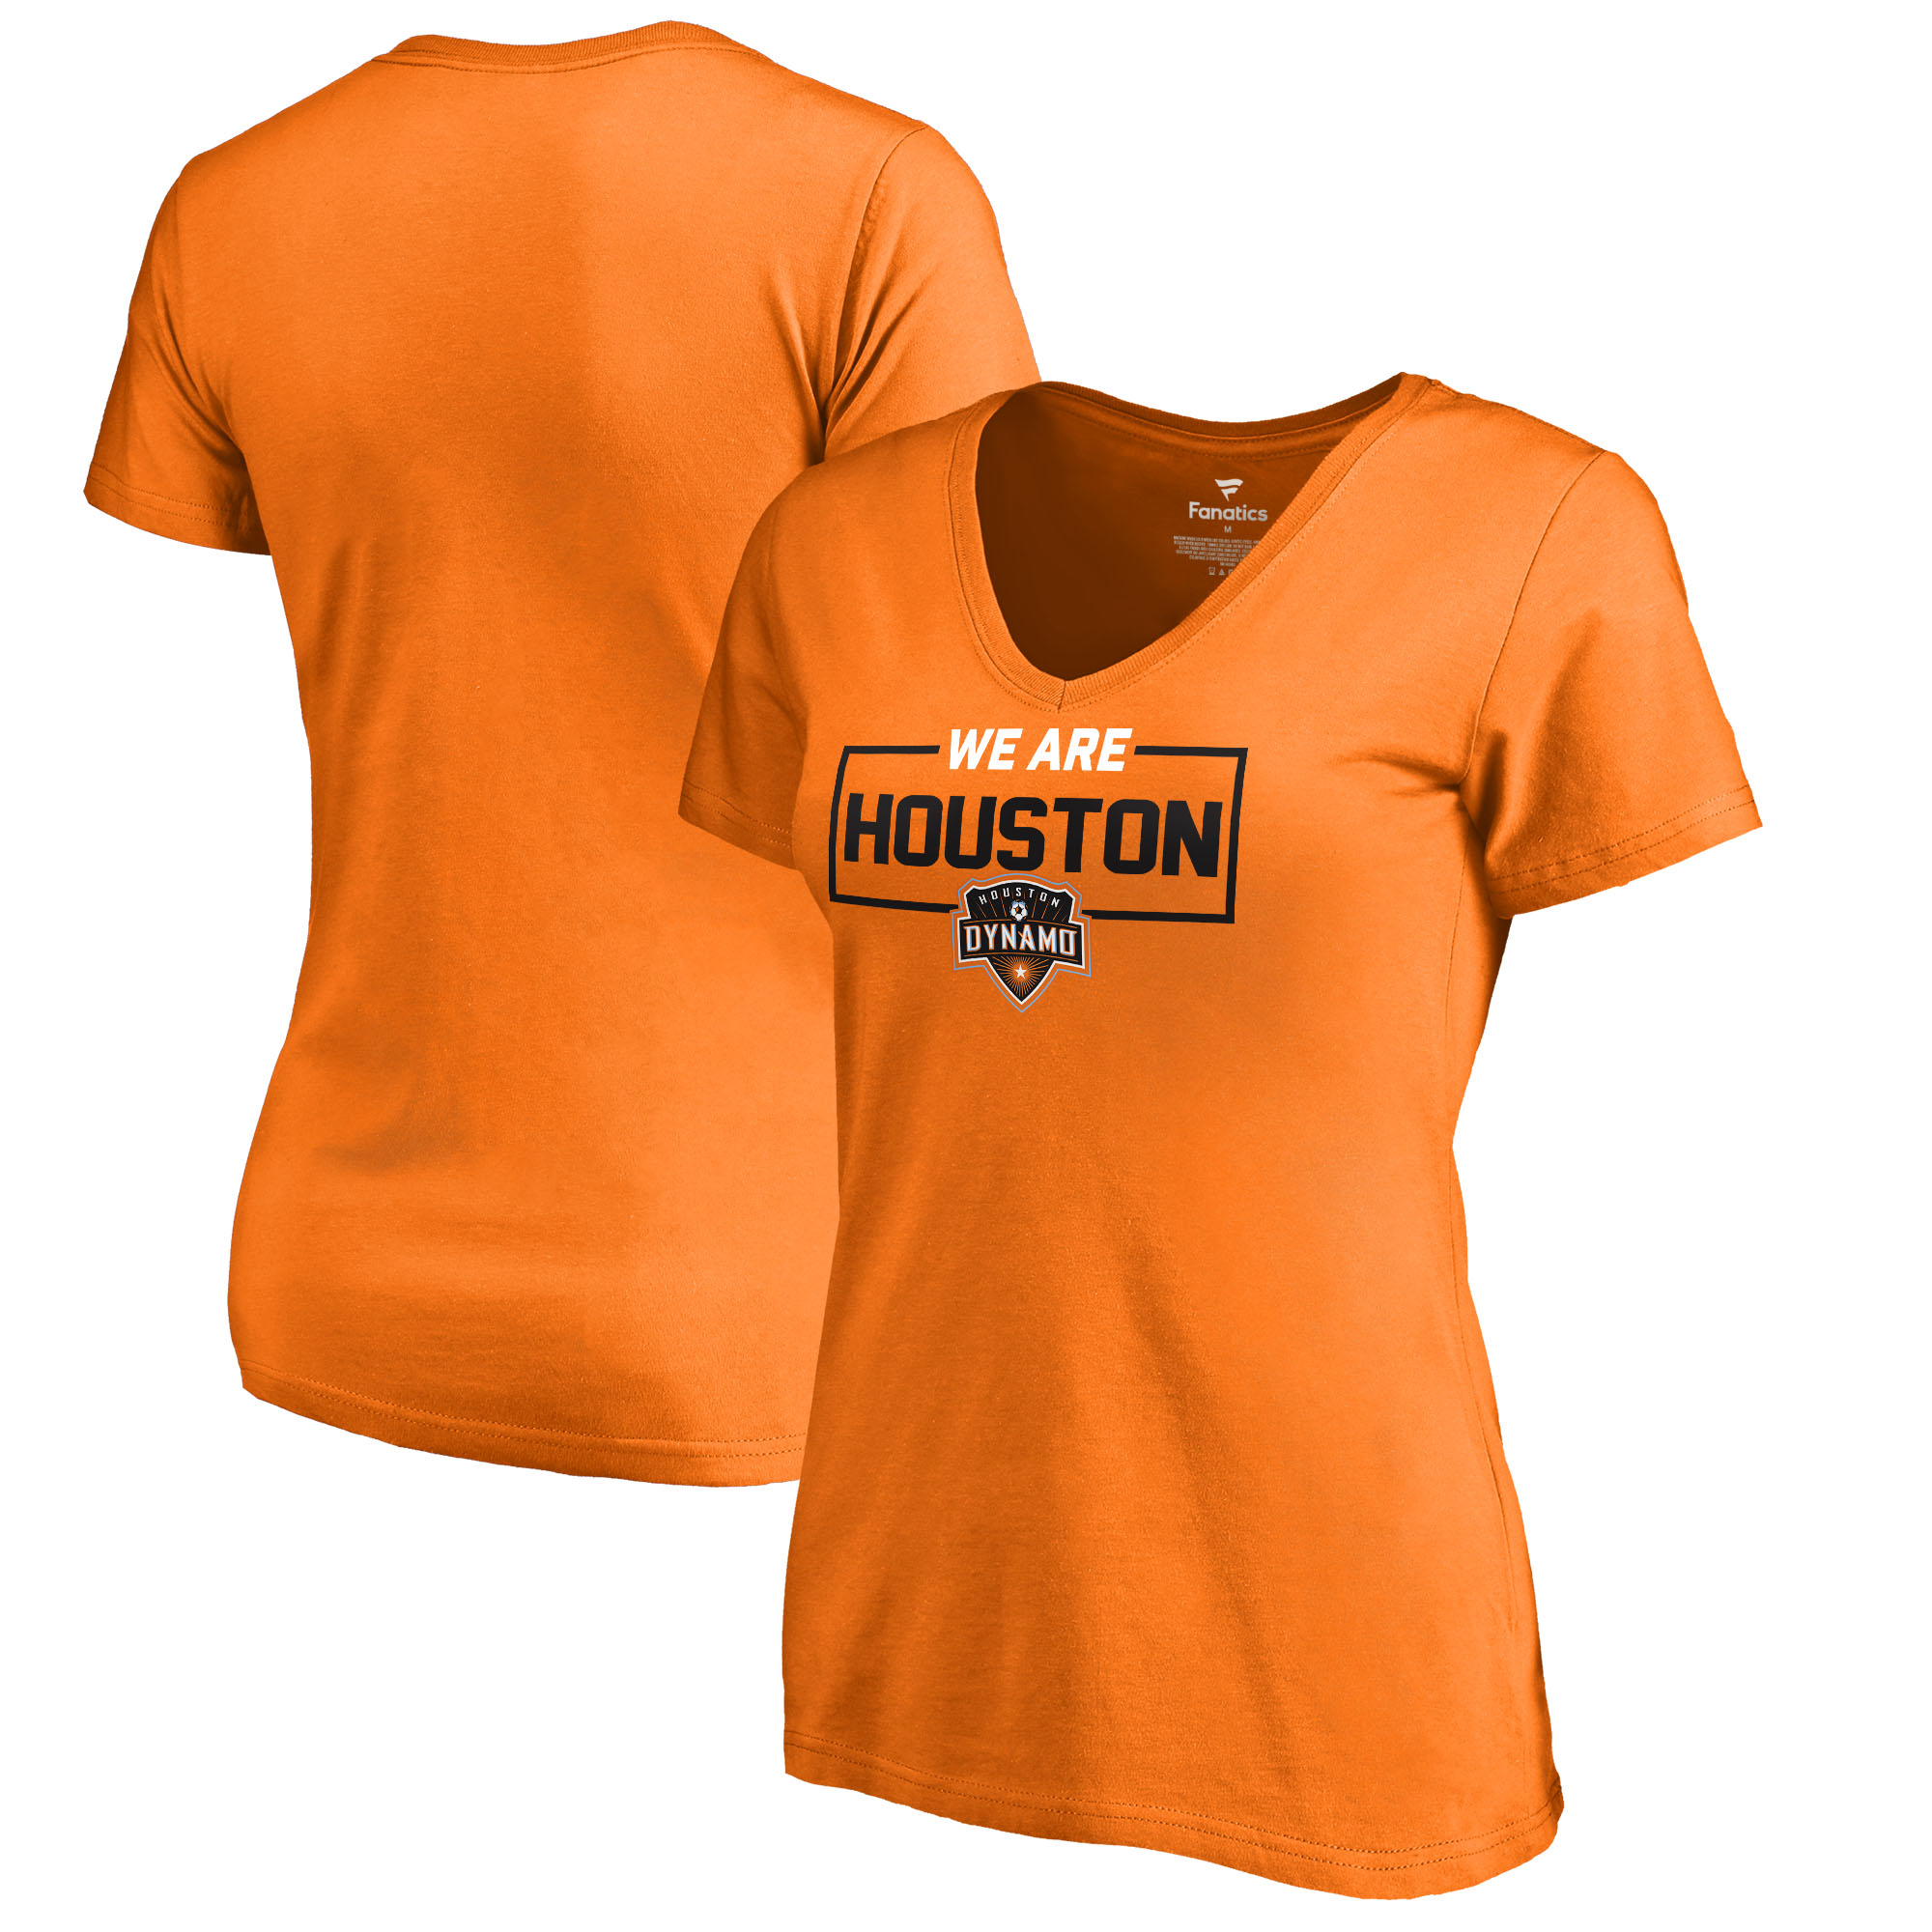 Houston Dynamo Fanatics Branded Women's We Are V-Neck T-Shirt - Orange